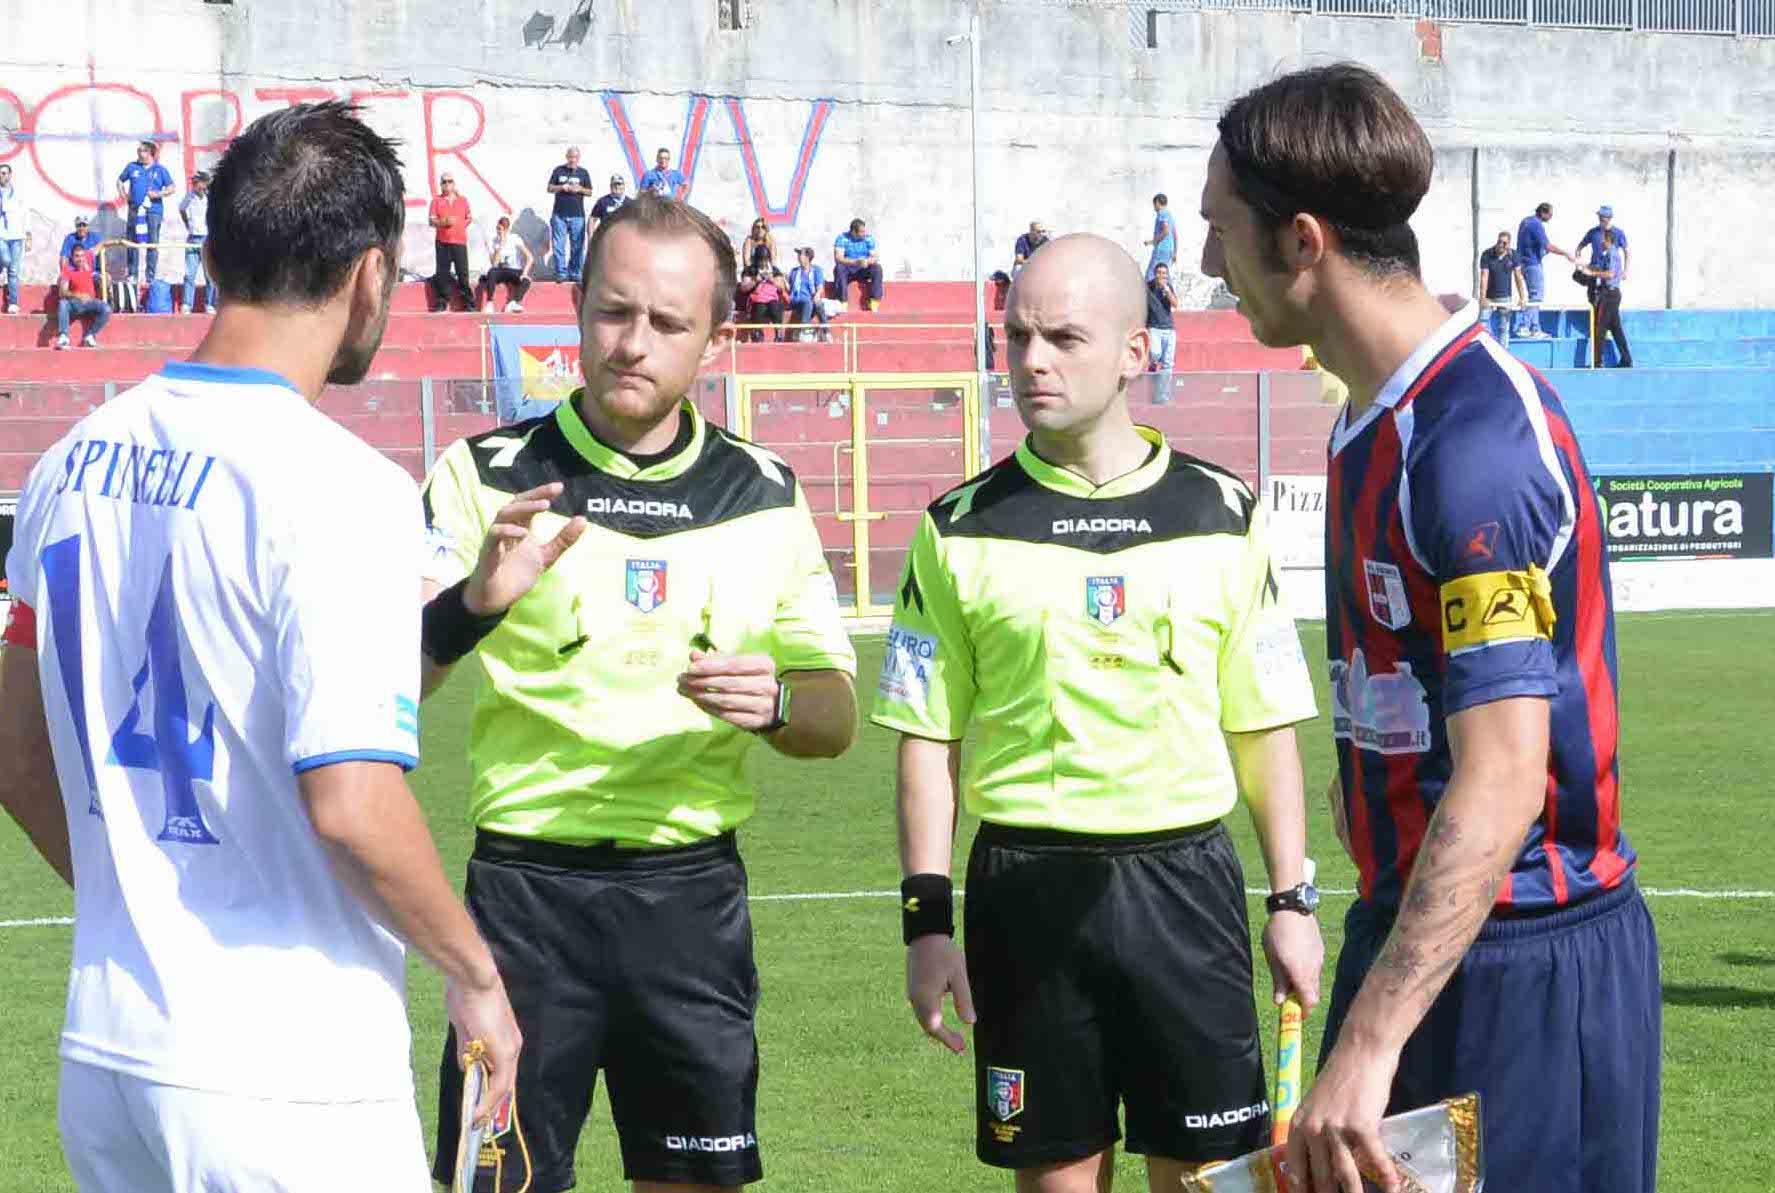 Siracusa temerario contro la Vibonese, non rischia e finisce 0 a 0